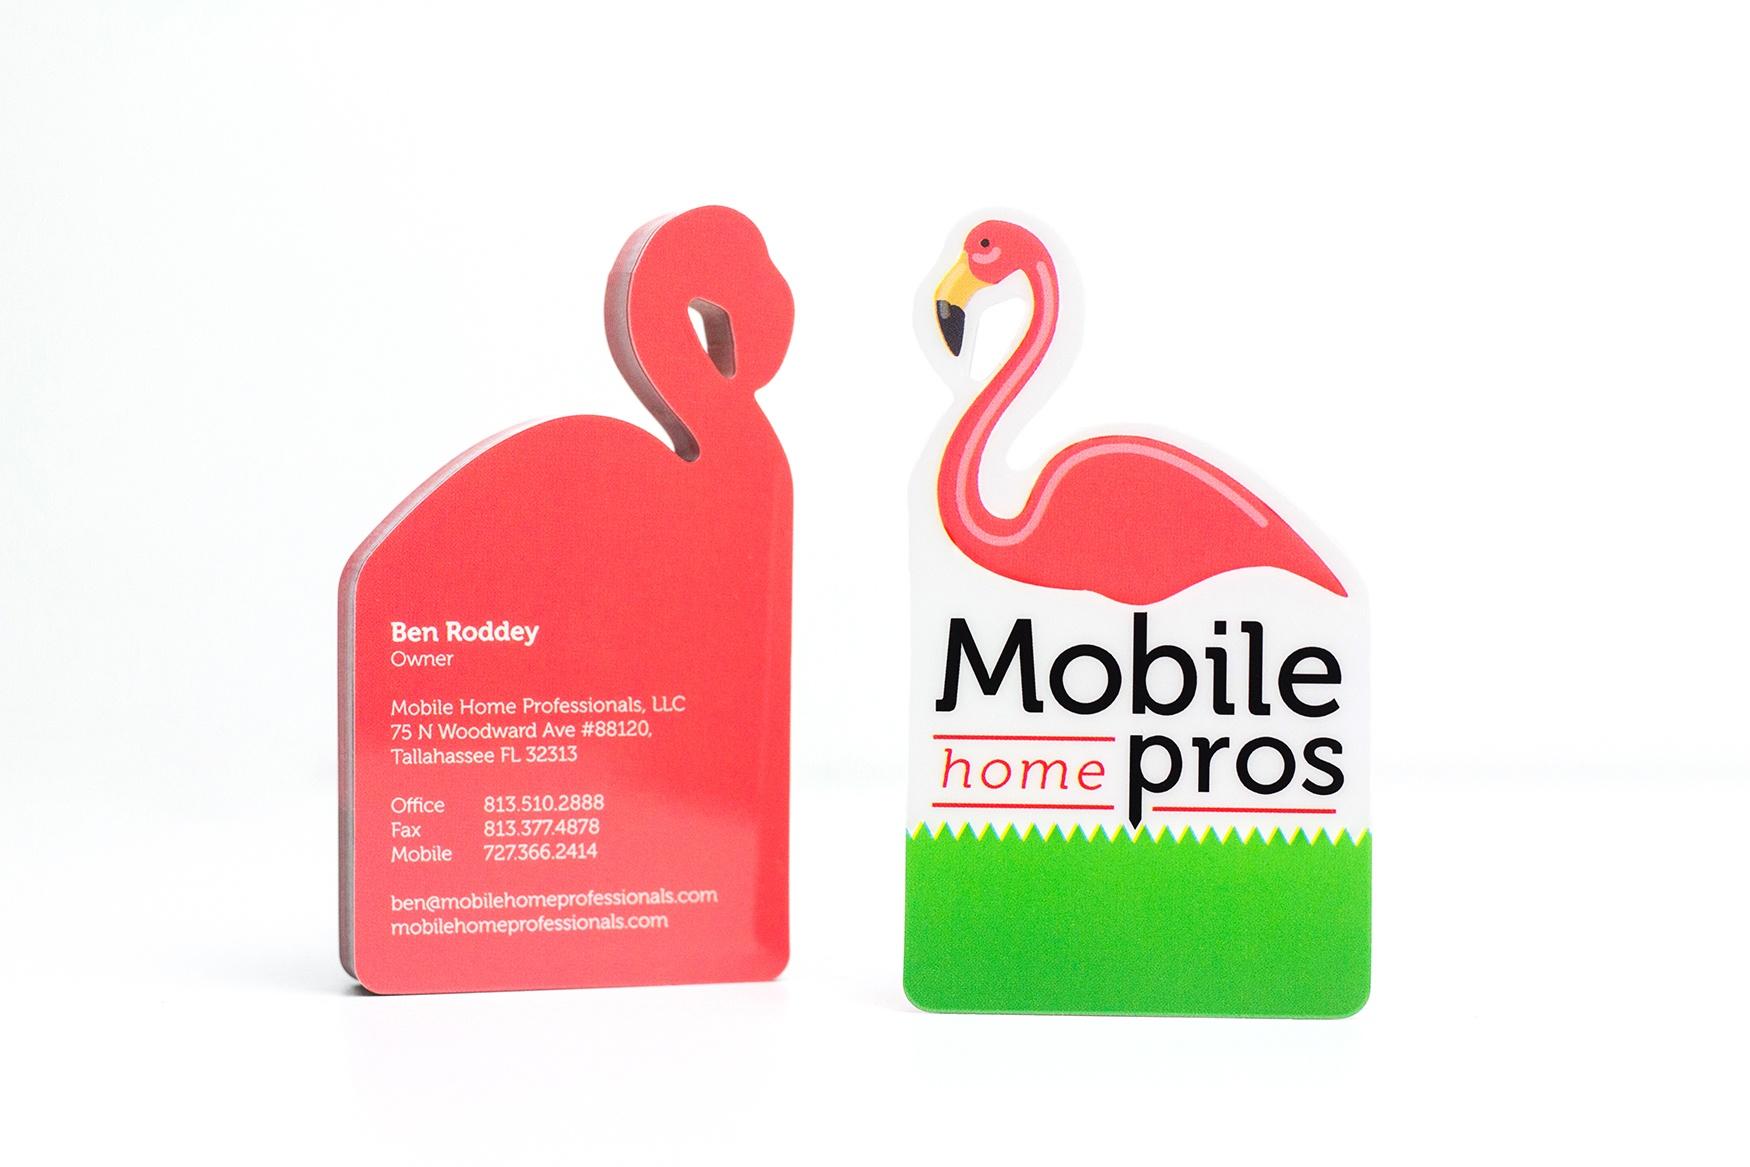 Mobile home professionals business card colourmoves